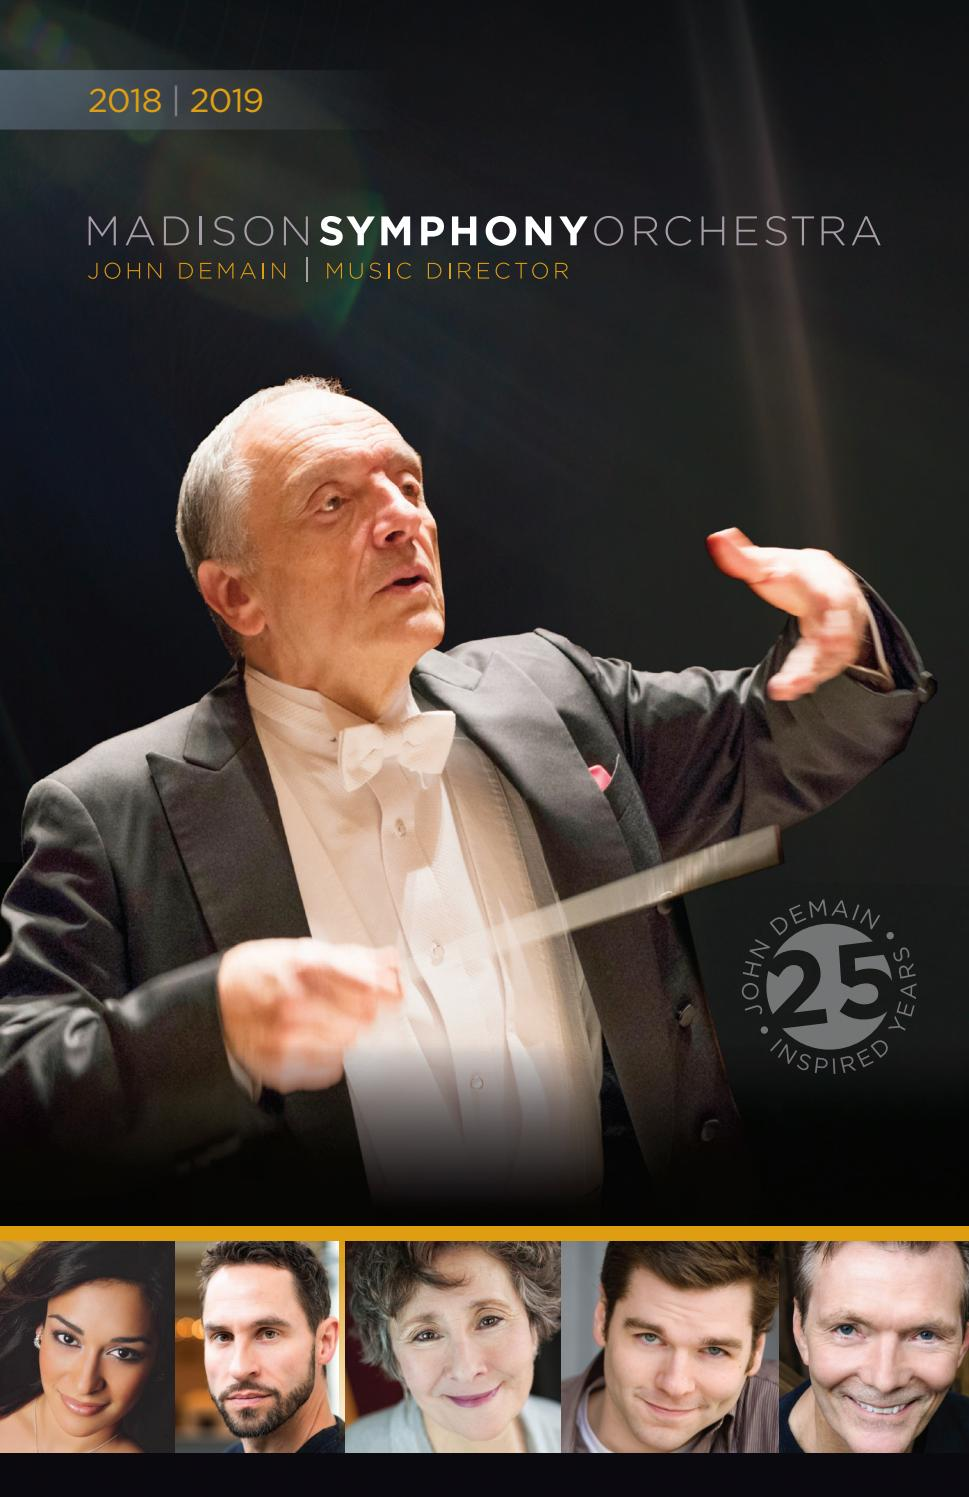 MSO Program Book, Dec 2018/Jan 2019 by Madison Symphony